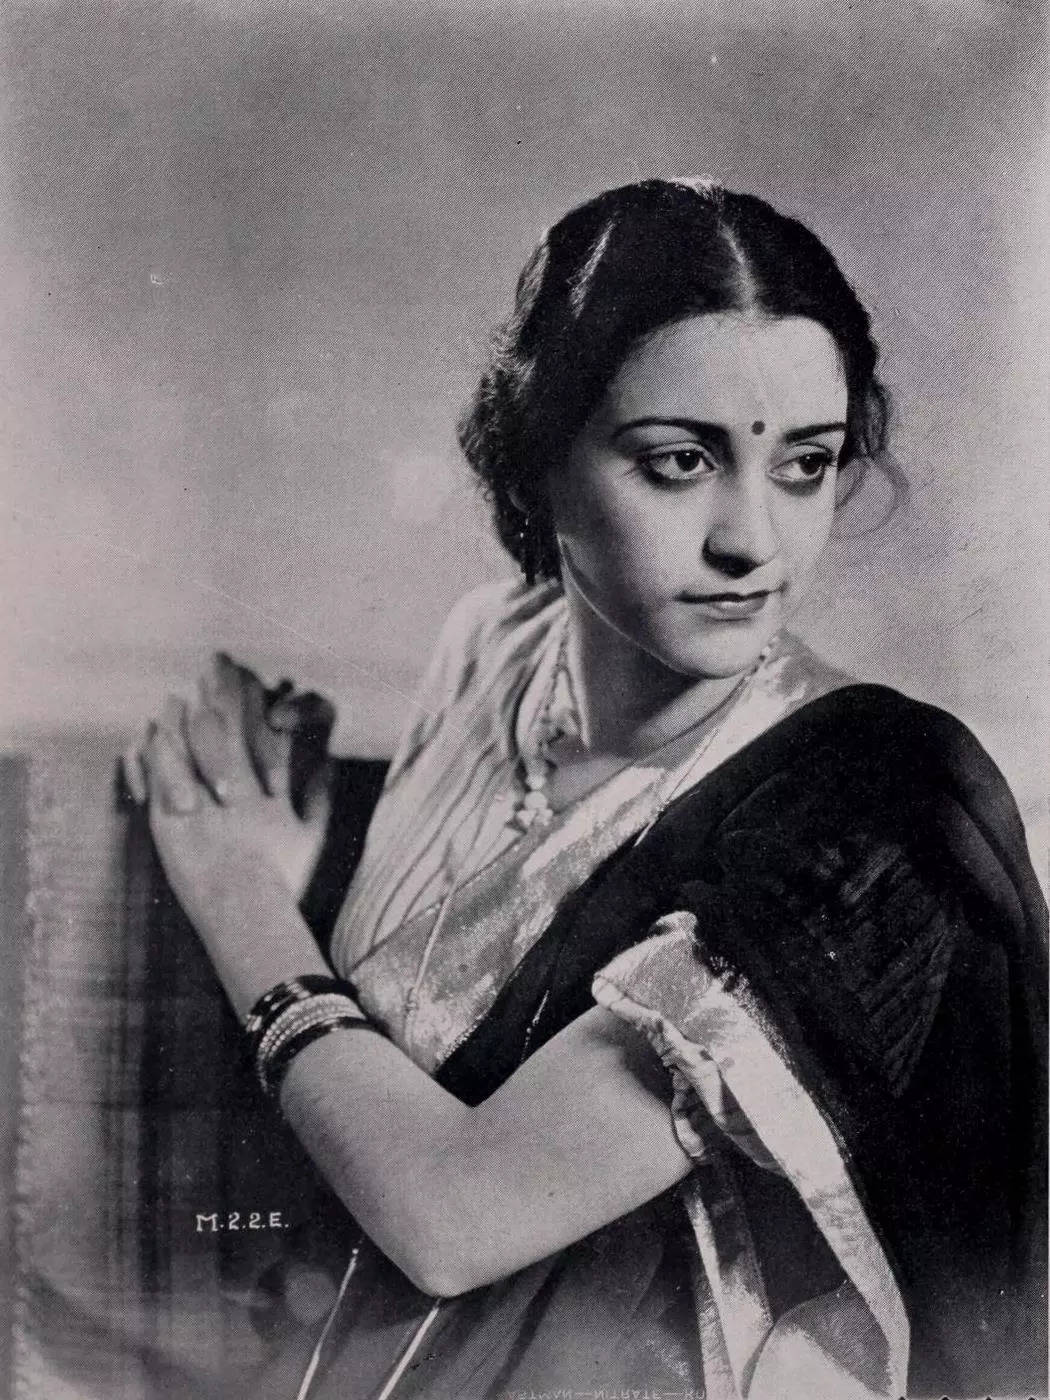 #GoldenFrames: Naseem Banu, the first female superstar of Bollywood